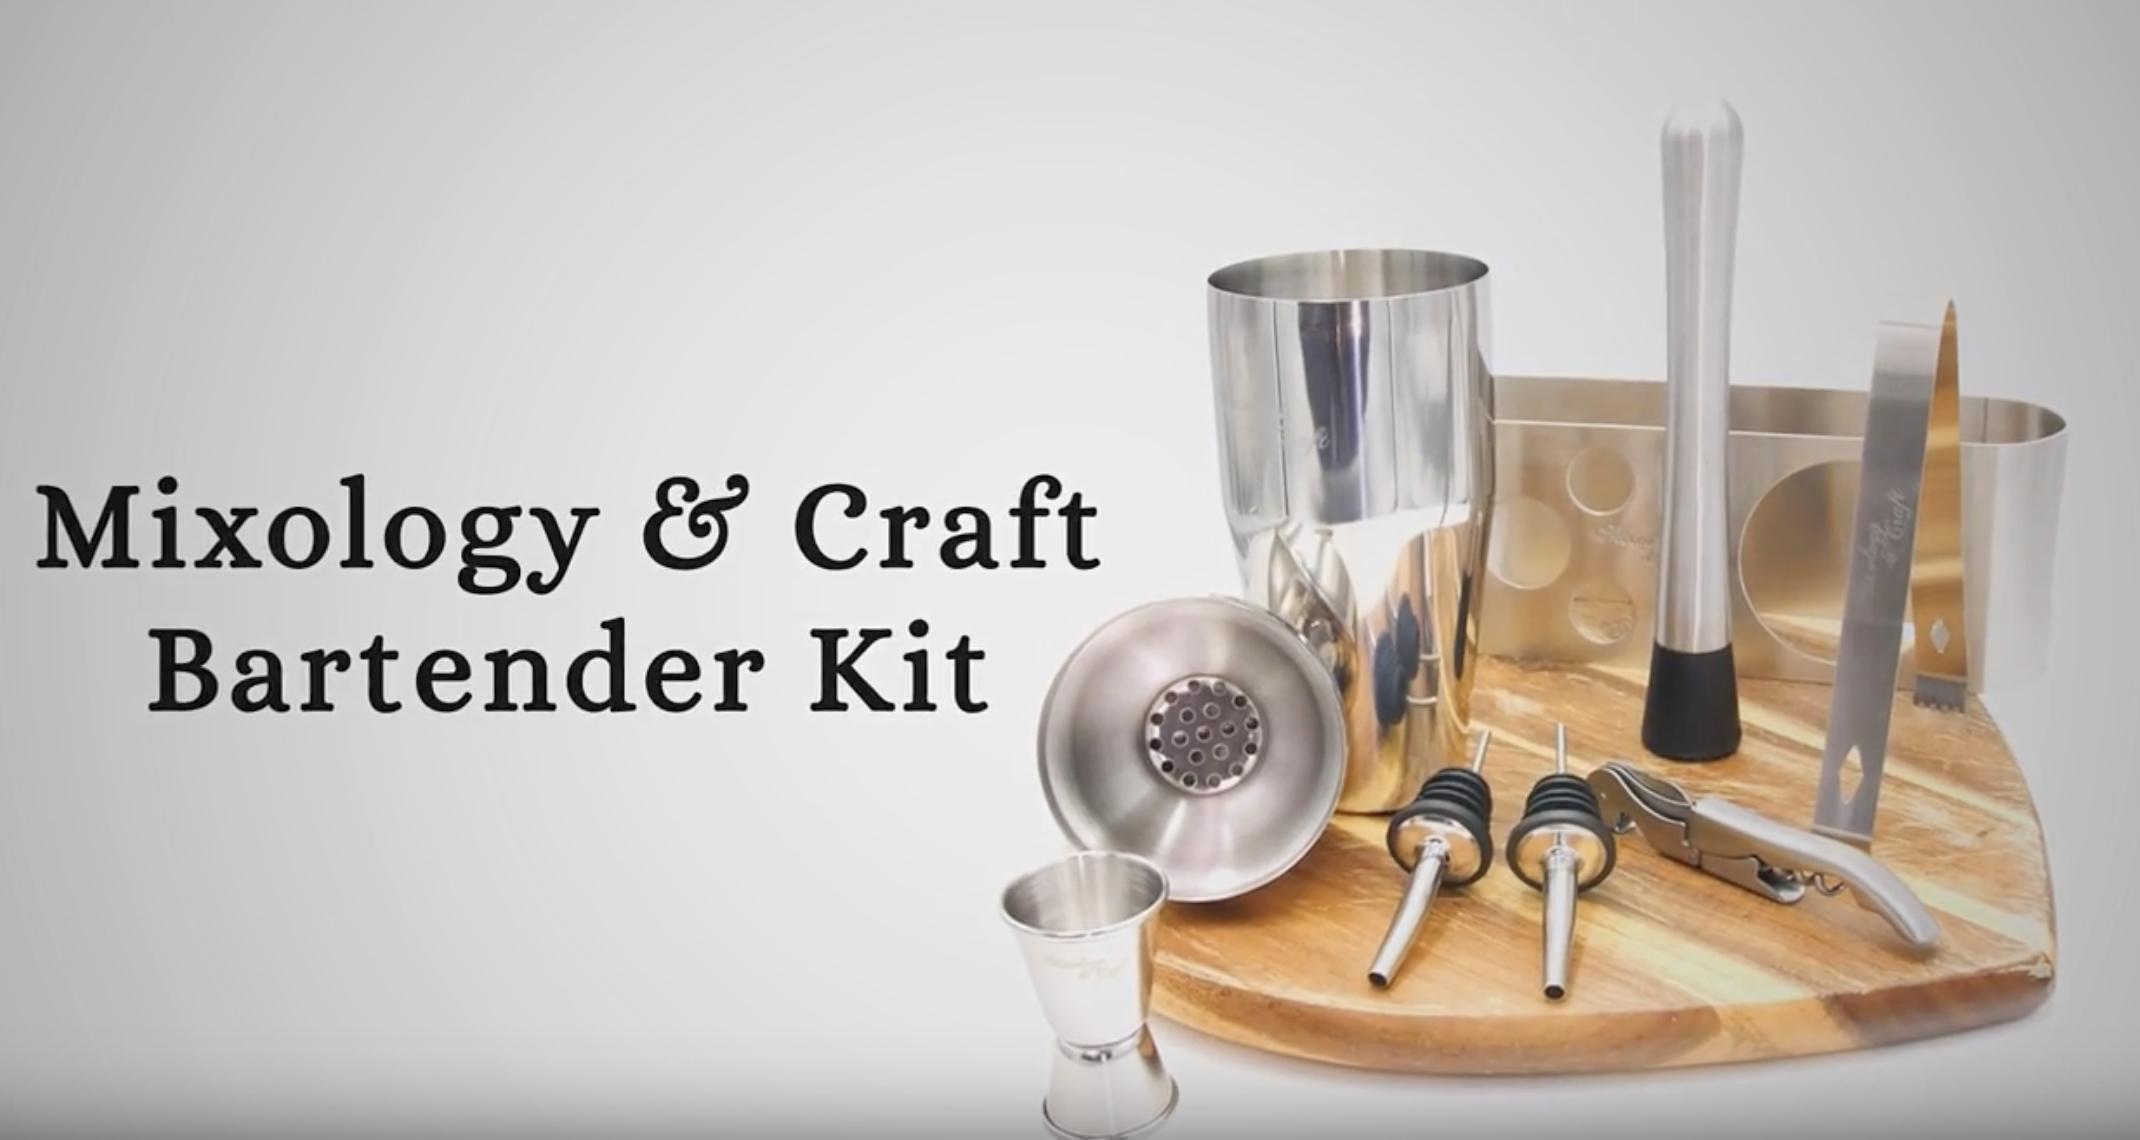 Bartender Kit Demo/Overview